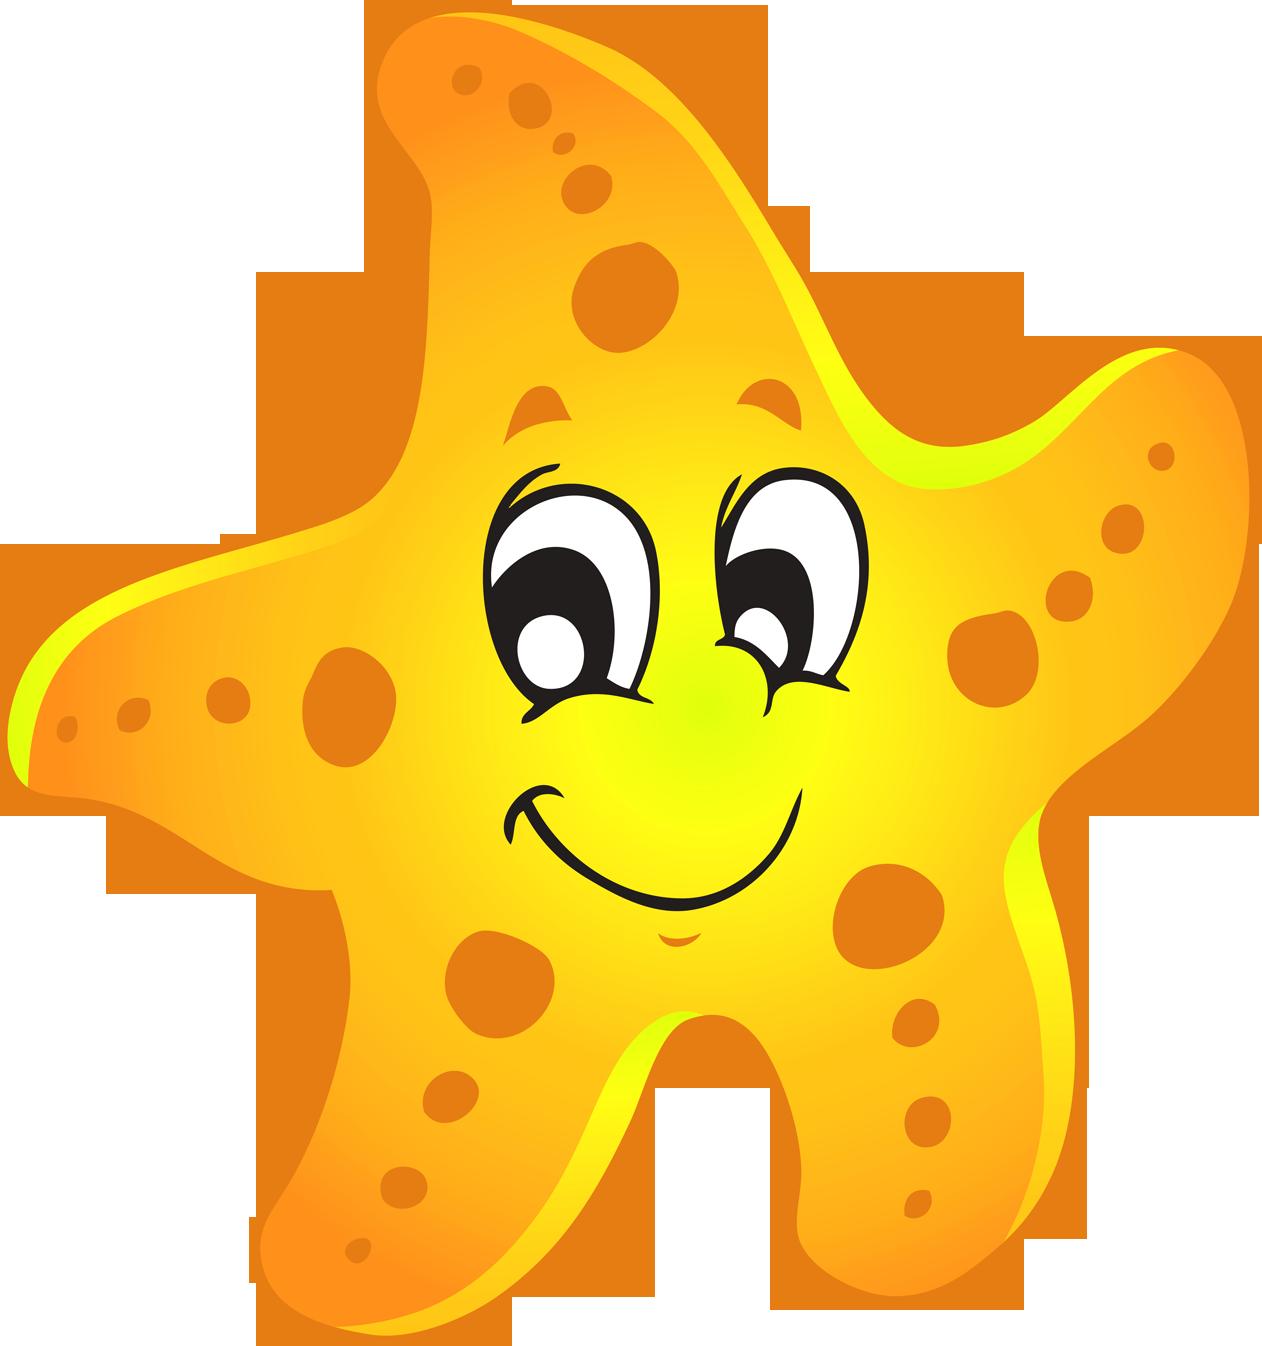 Sea star look at. Water clipart cartoon